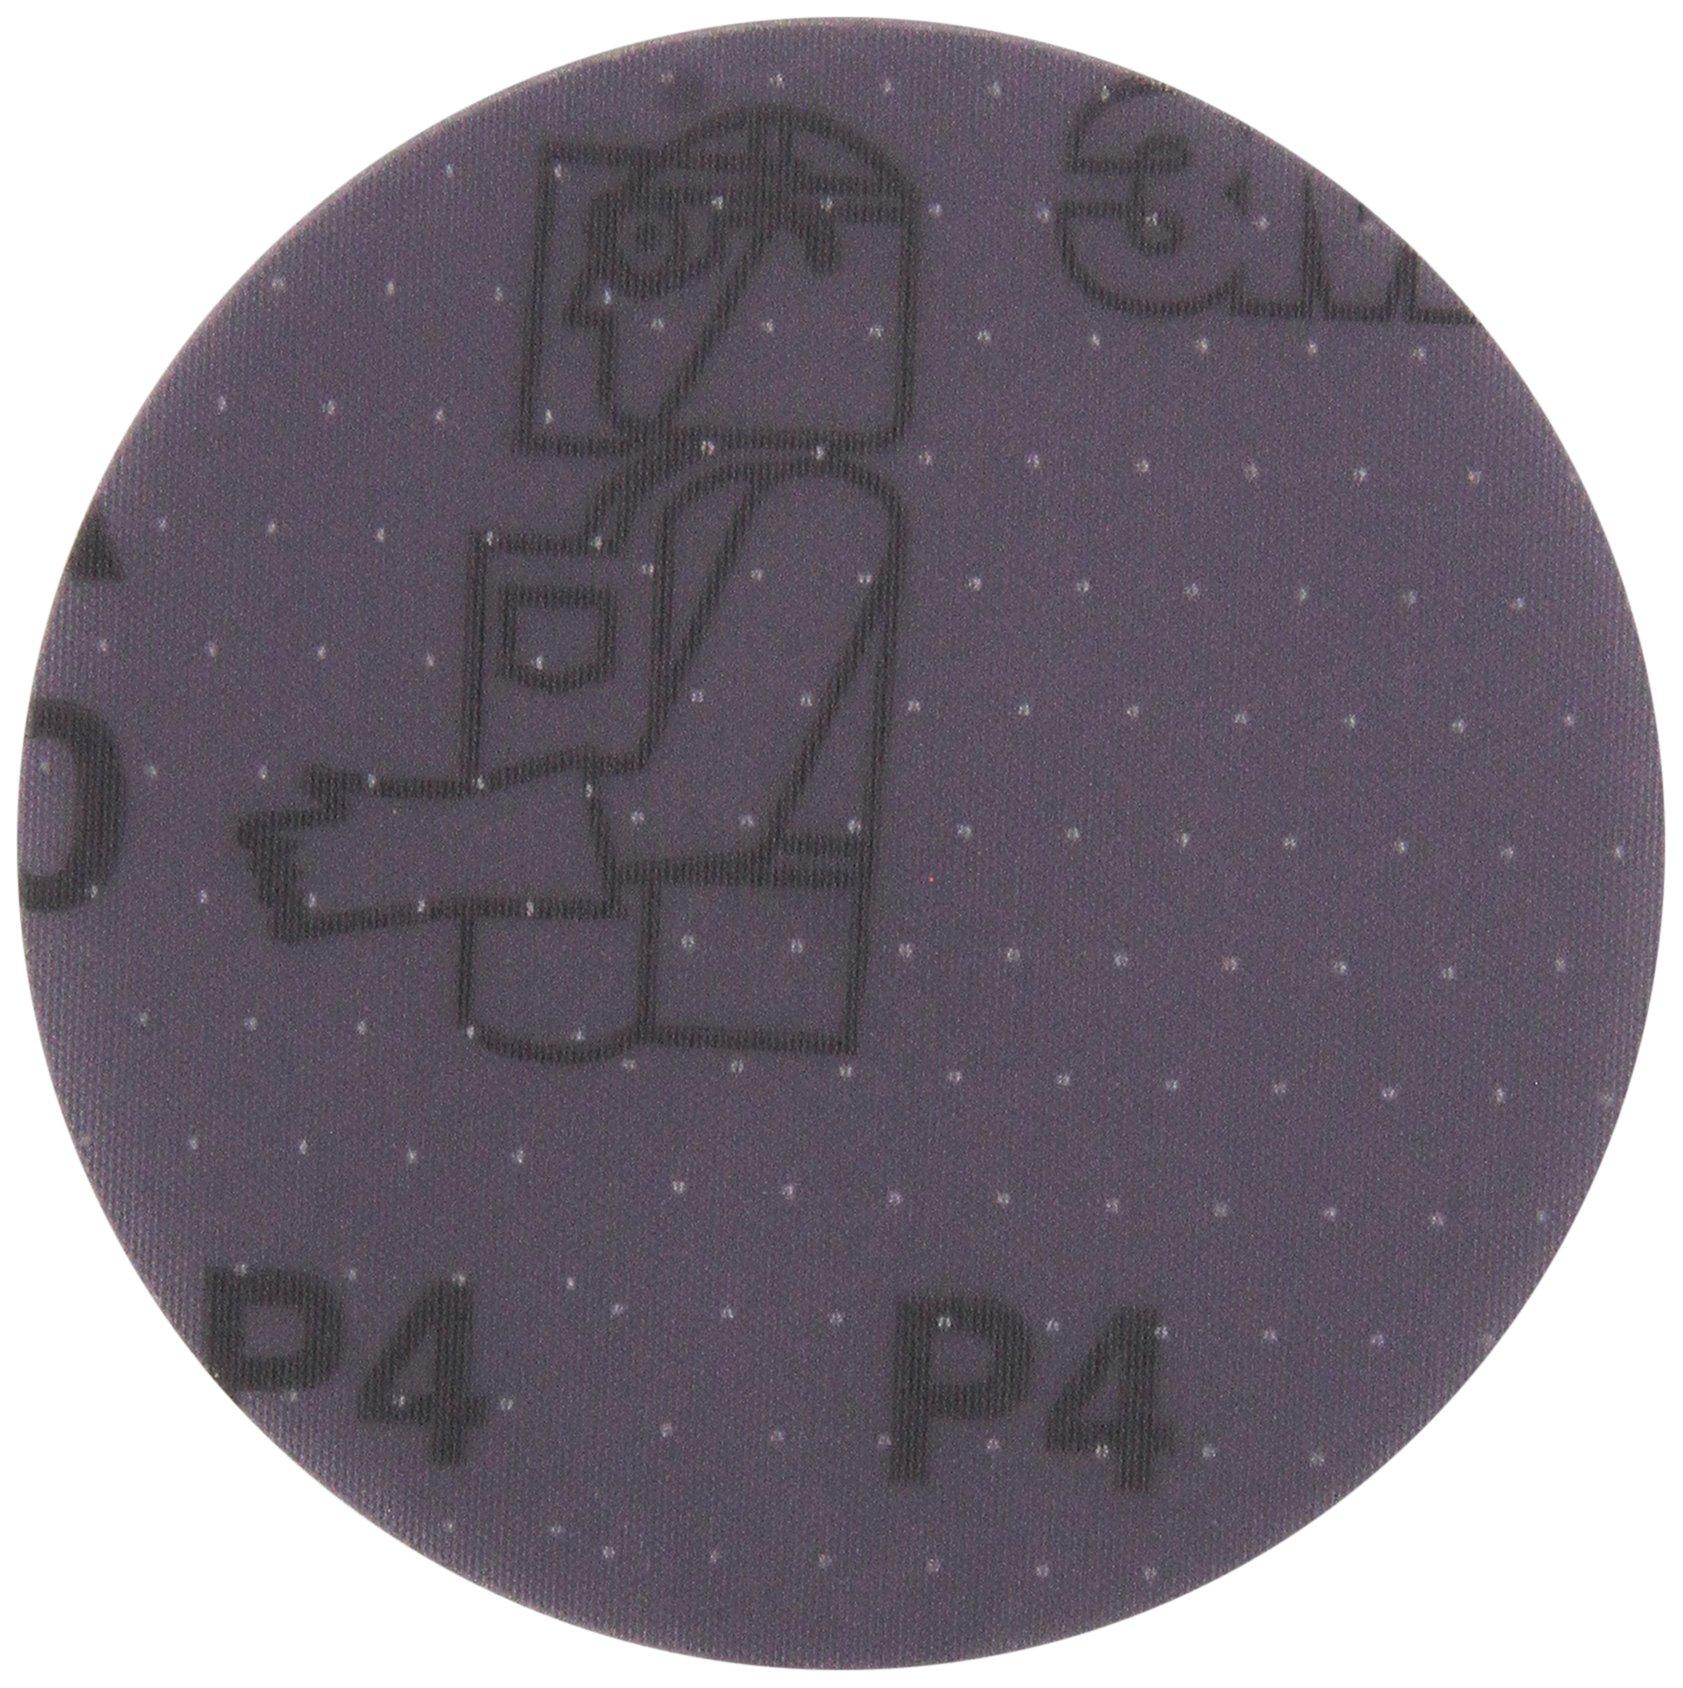 3M 02094 Trizact Hookit 3'' P1500 Grit Clear Coat Sanding Disc by 3M (Image #2)